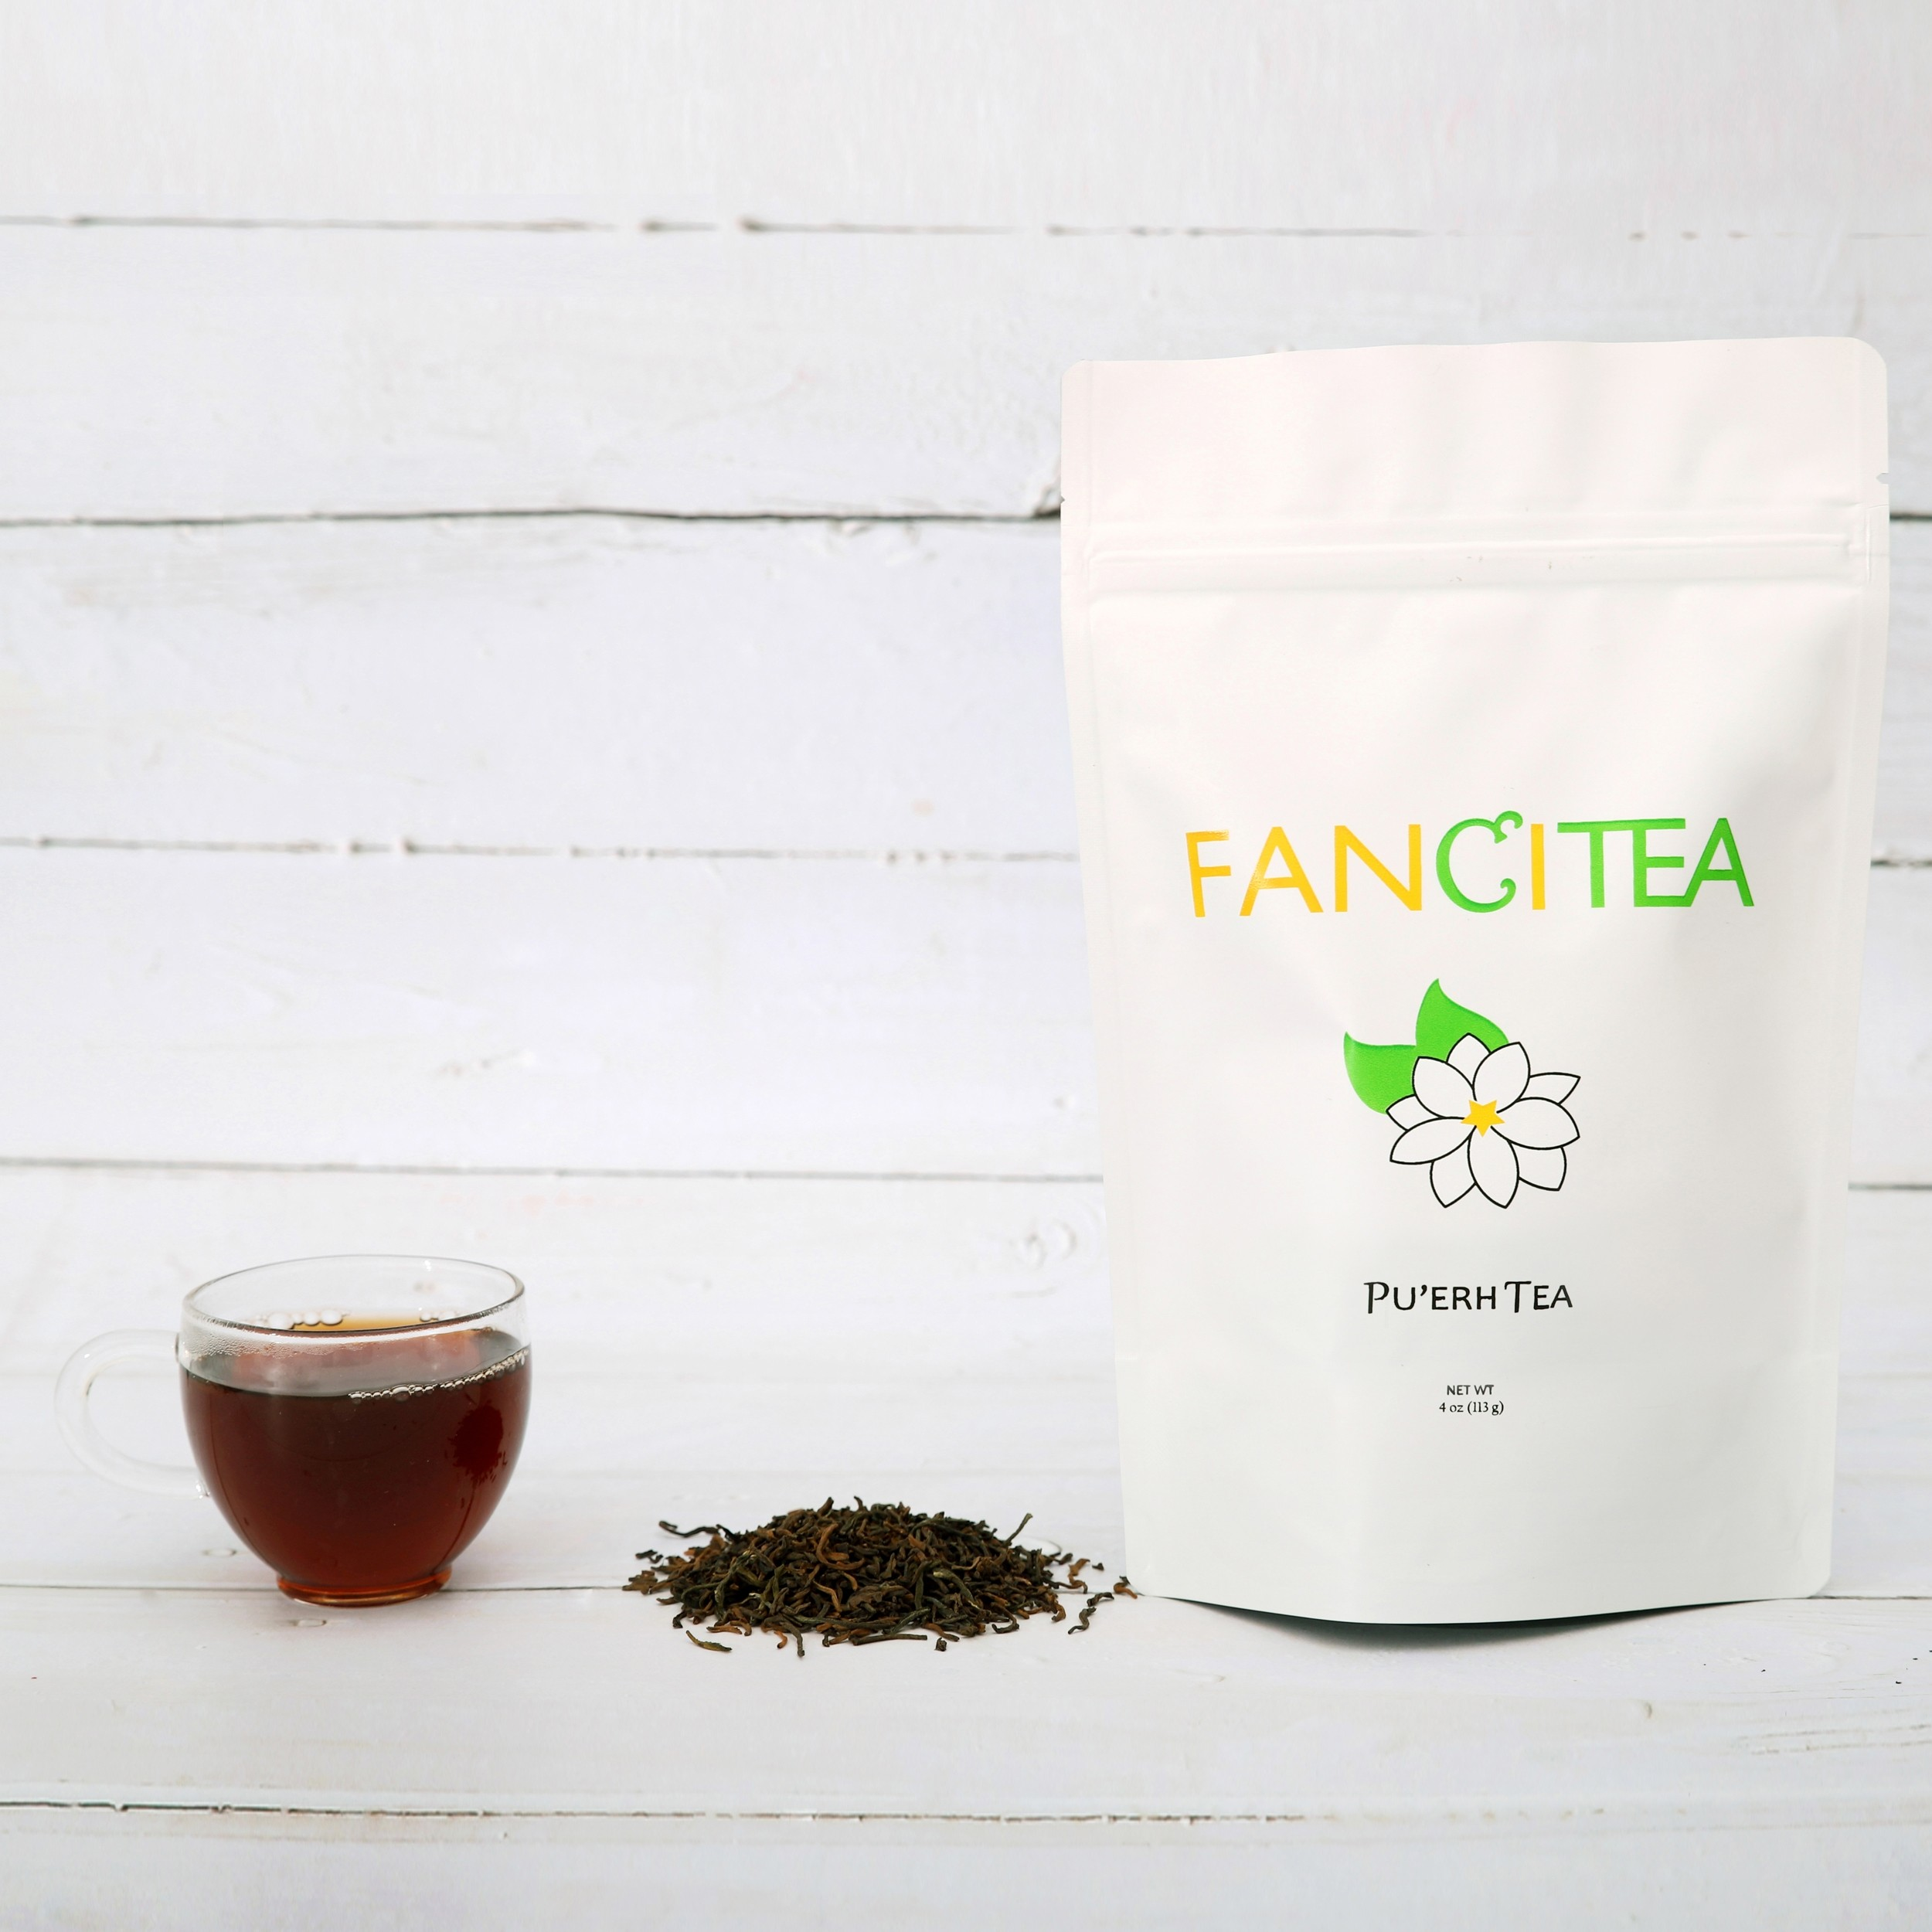 Fancitea High Quality Famous Chinese Pu'erh Loose Tea Leaves 4oz/45 servings